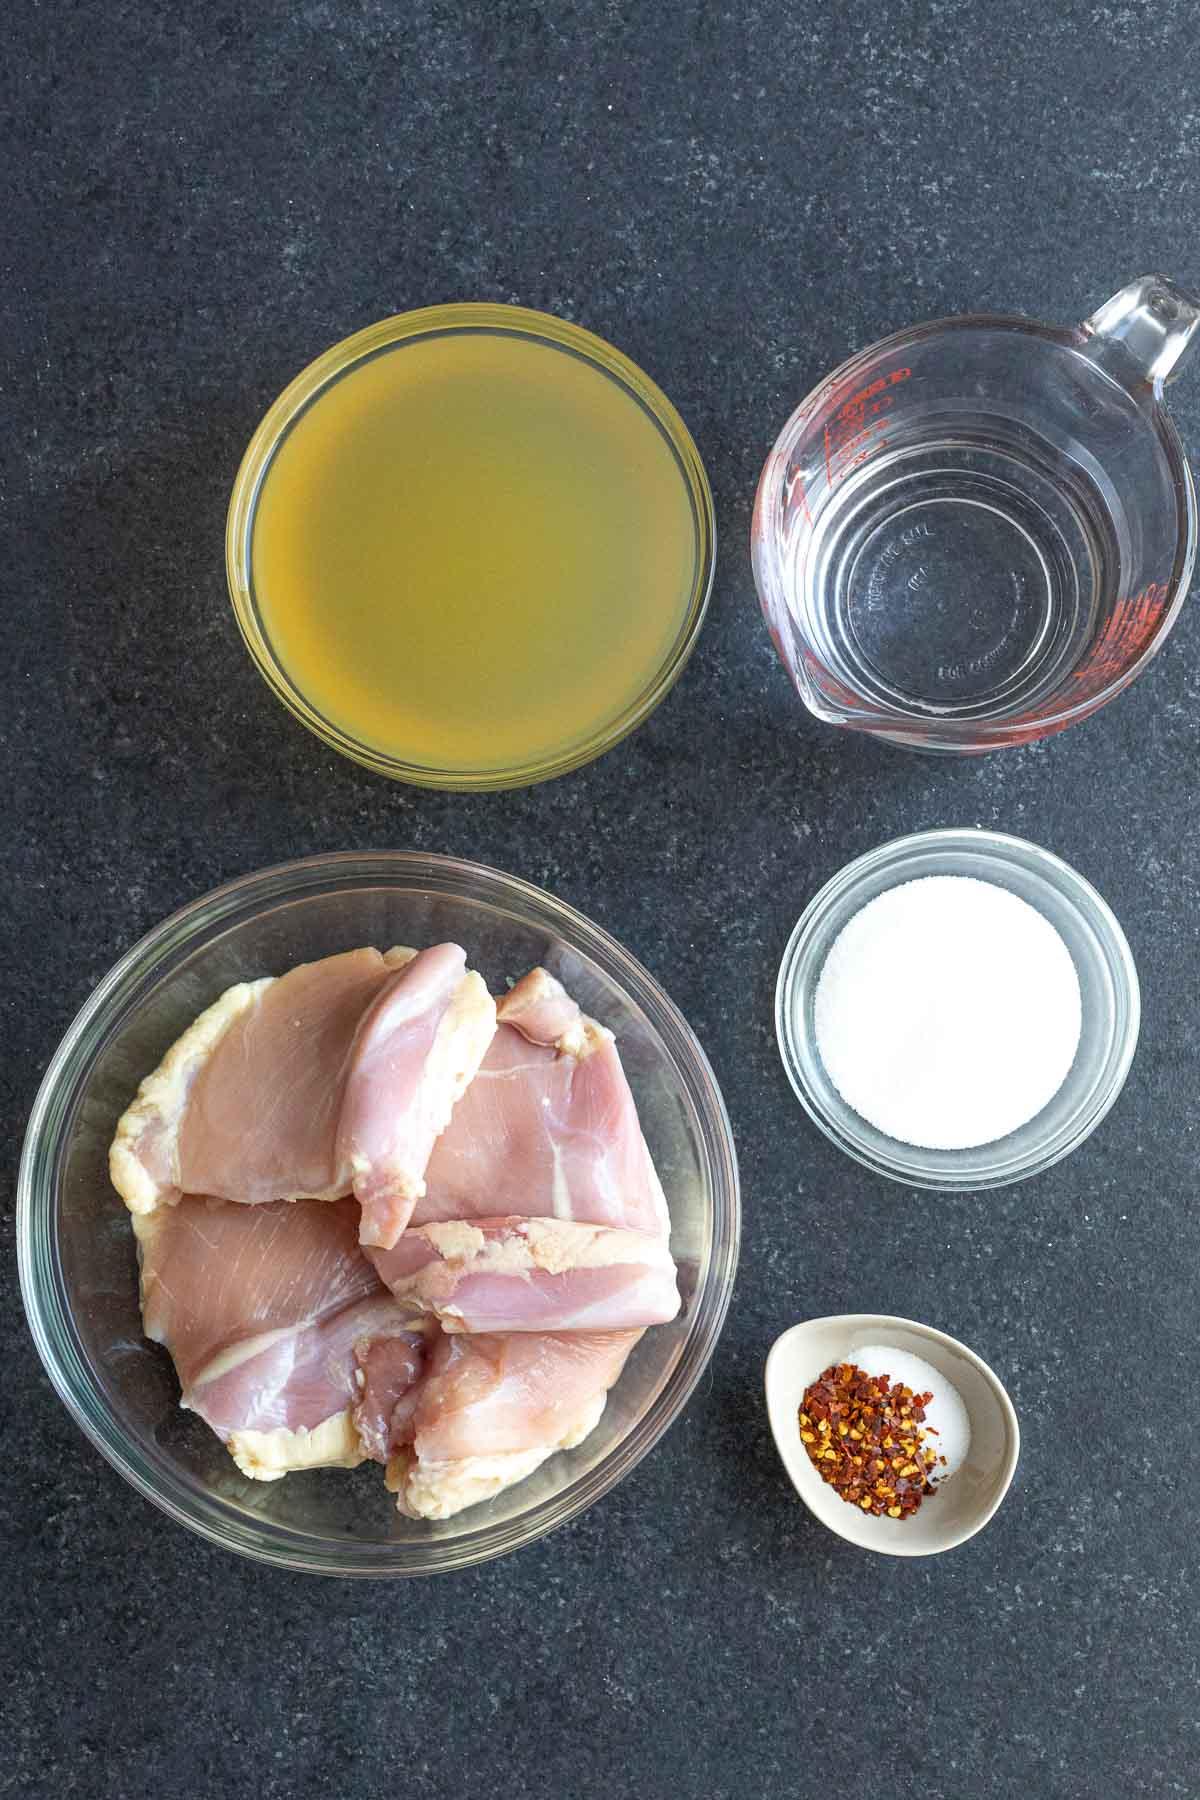 Ingredients for Carolina BBQ Vinegar Shredded Chicken in prep bowls